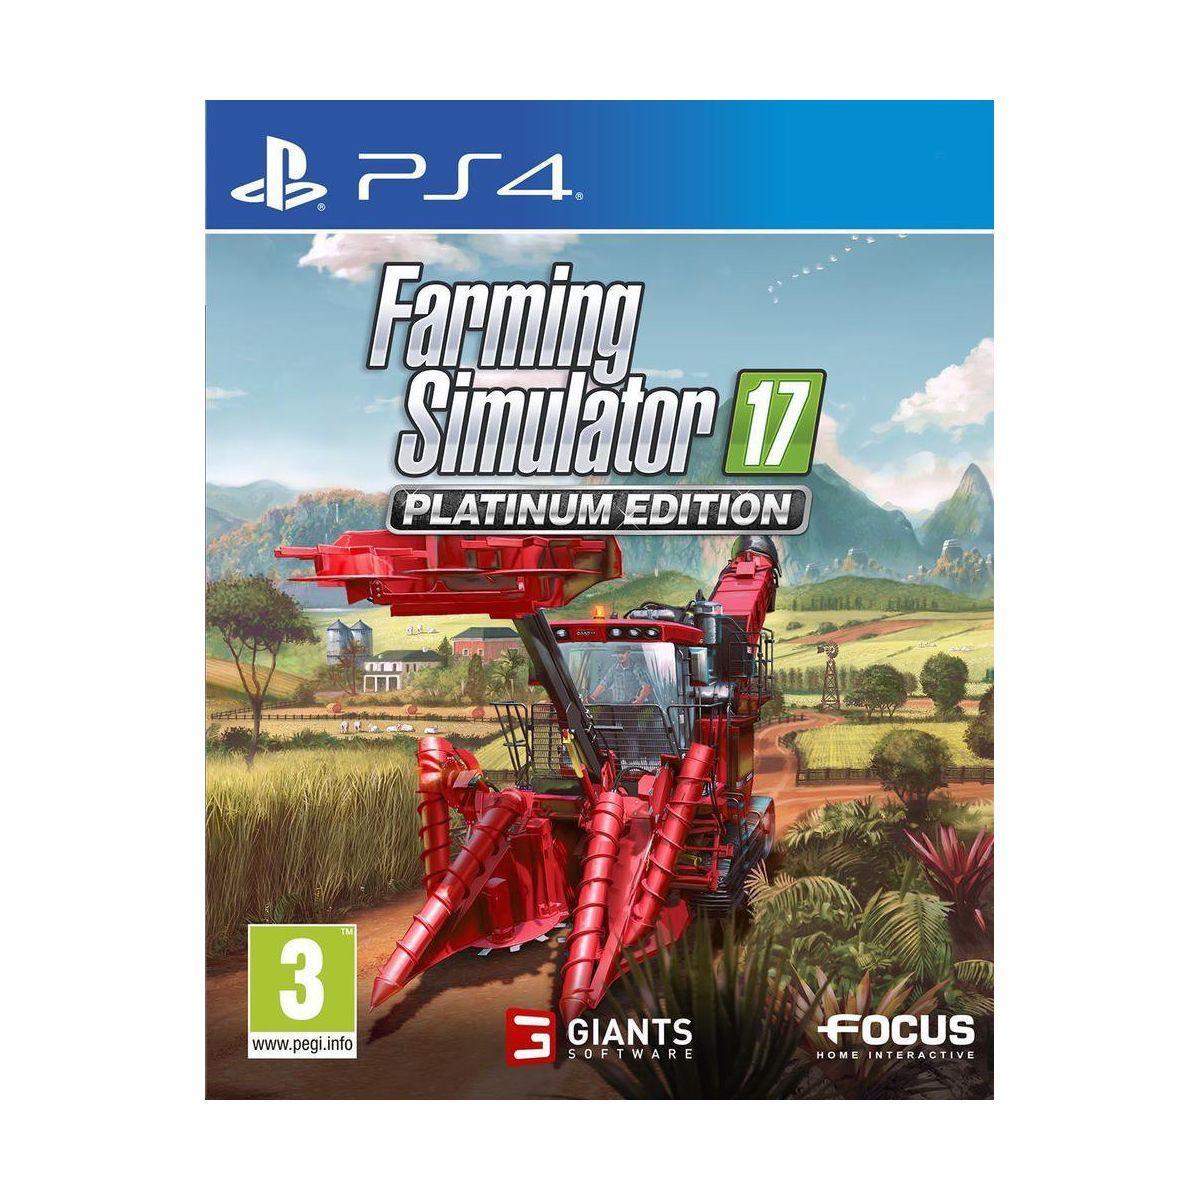 Jeu ps4 focus farming simulator 17 - edi (photo)